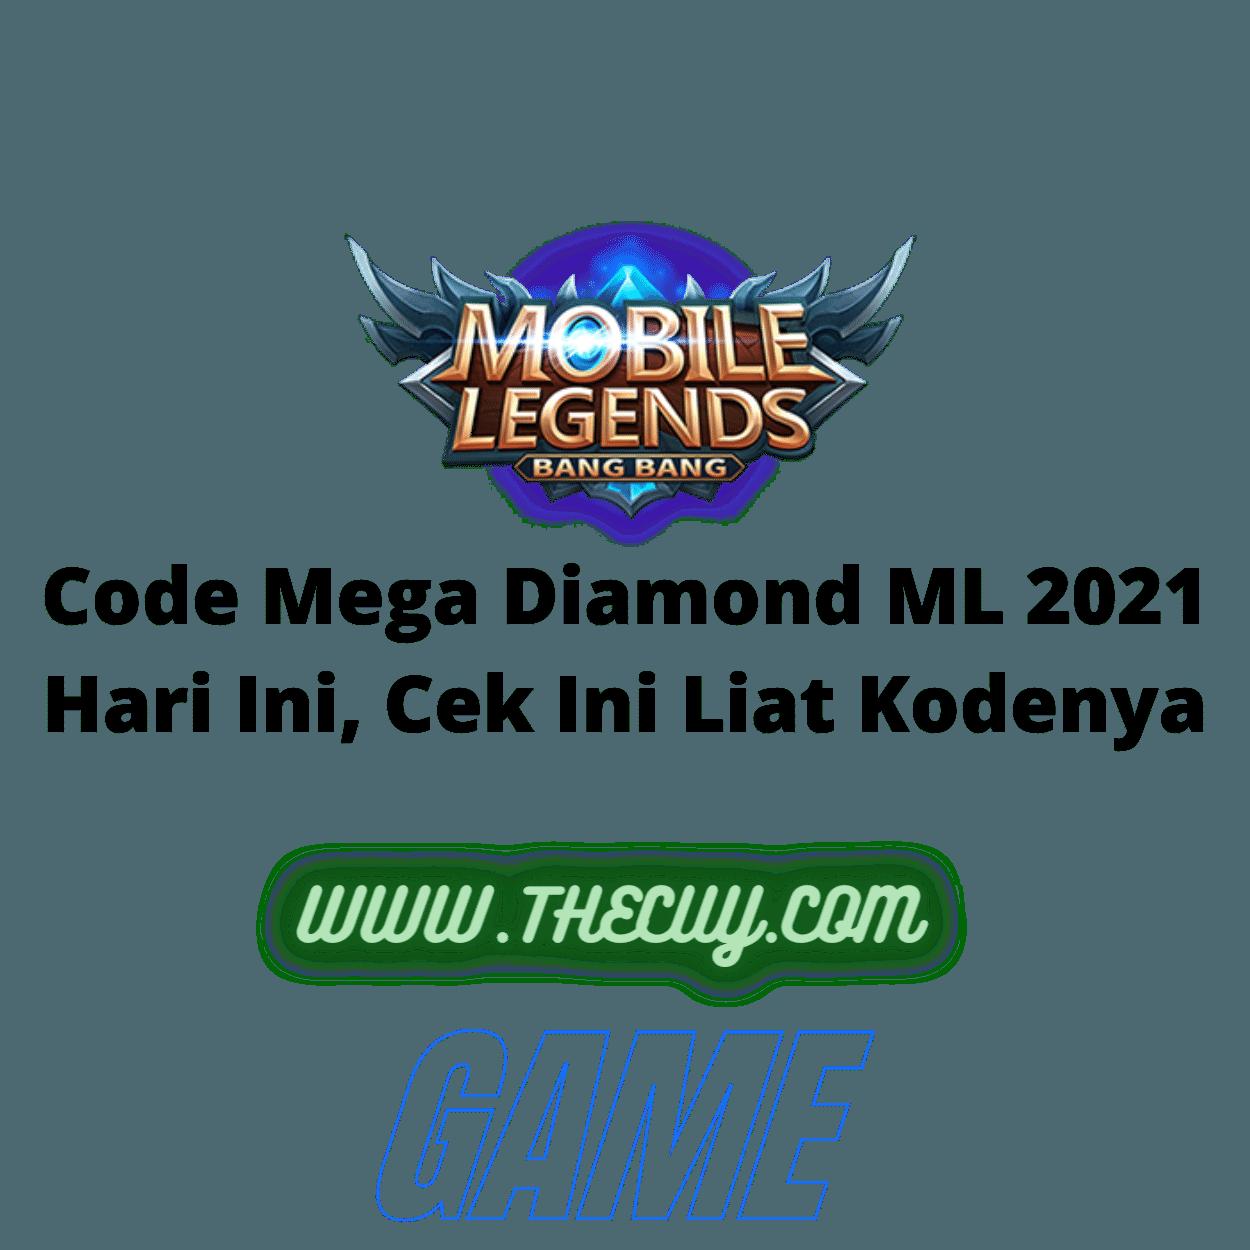 Code Mega Diamond ML 2021 Hari Ini, Cek Ini Liat Kodenya